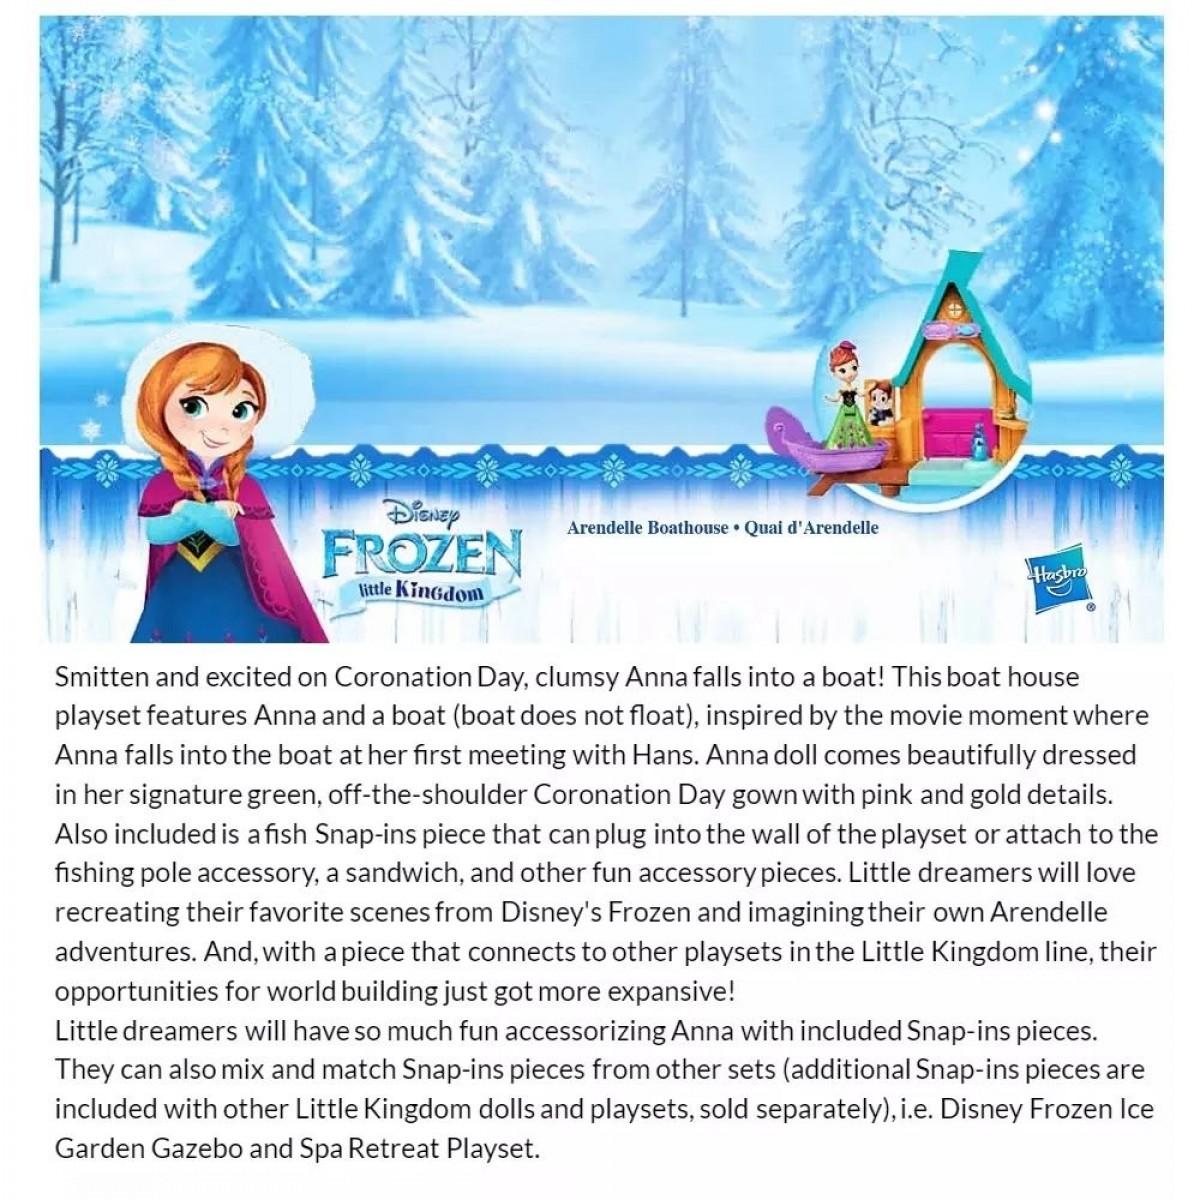 Hasbro Disney Frozen Little Kingdom Series Mini Playset Toys (Age 3+) - Kids Toys and Games